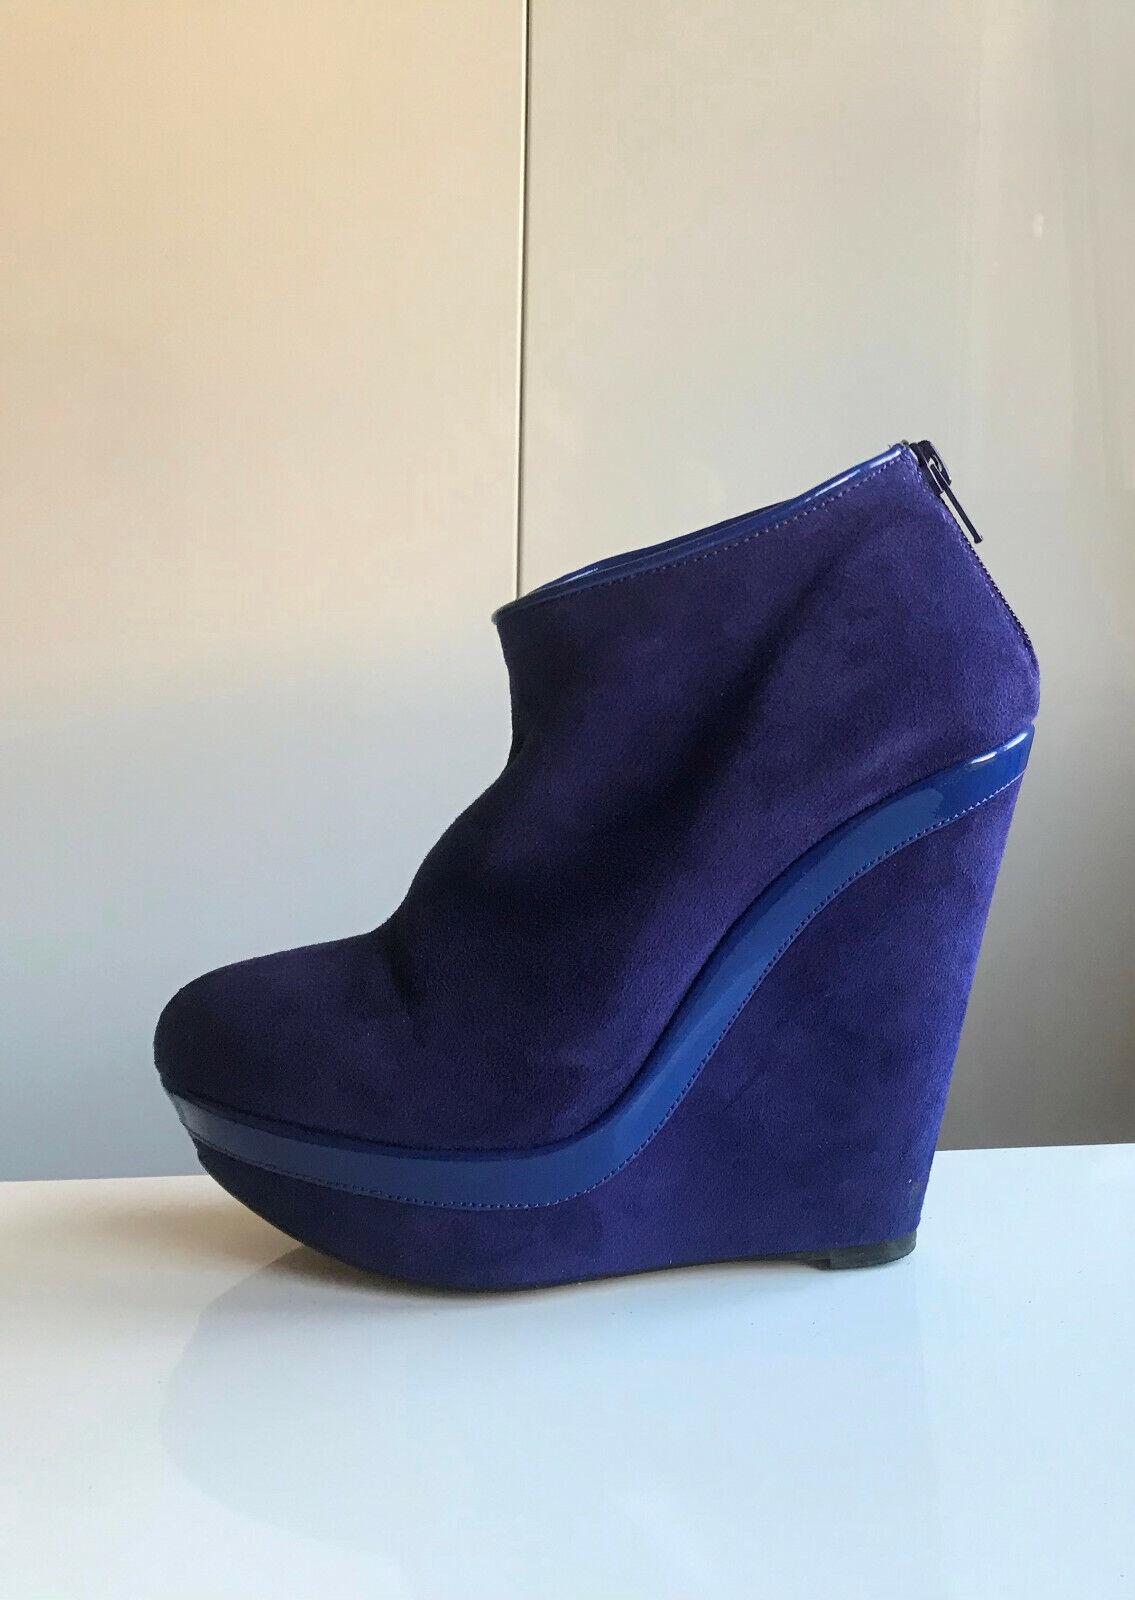 Keil Stiefelette Ankle Stiefel 37 Mai Piu Senza blau royalblau azur Wildleder Lack